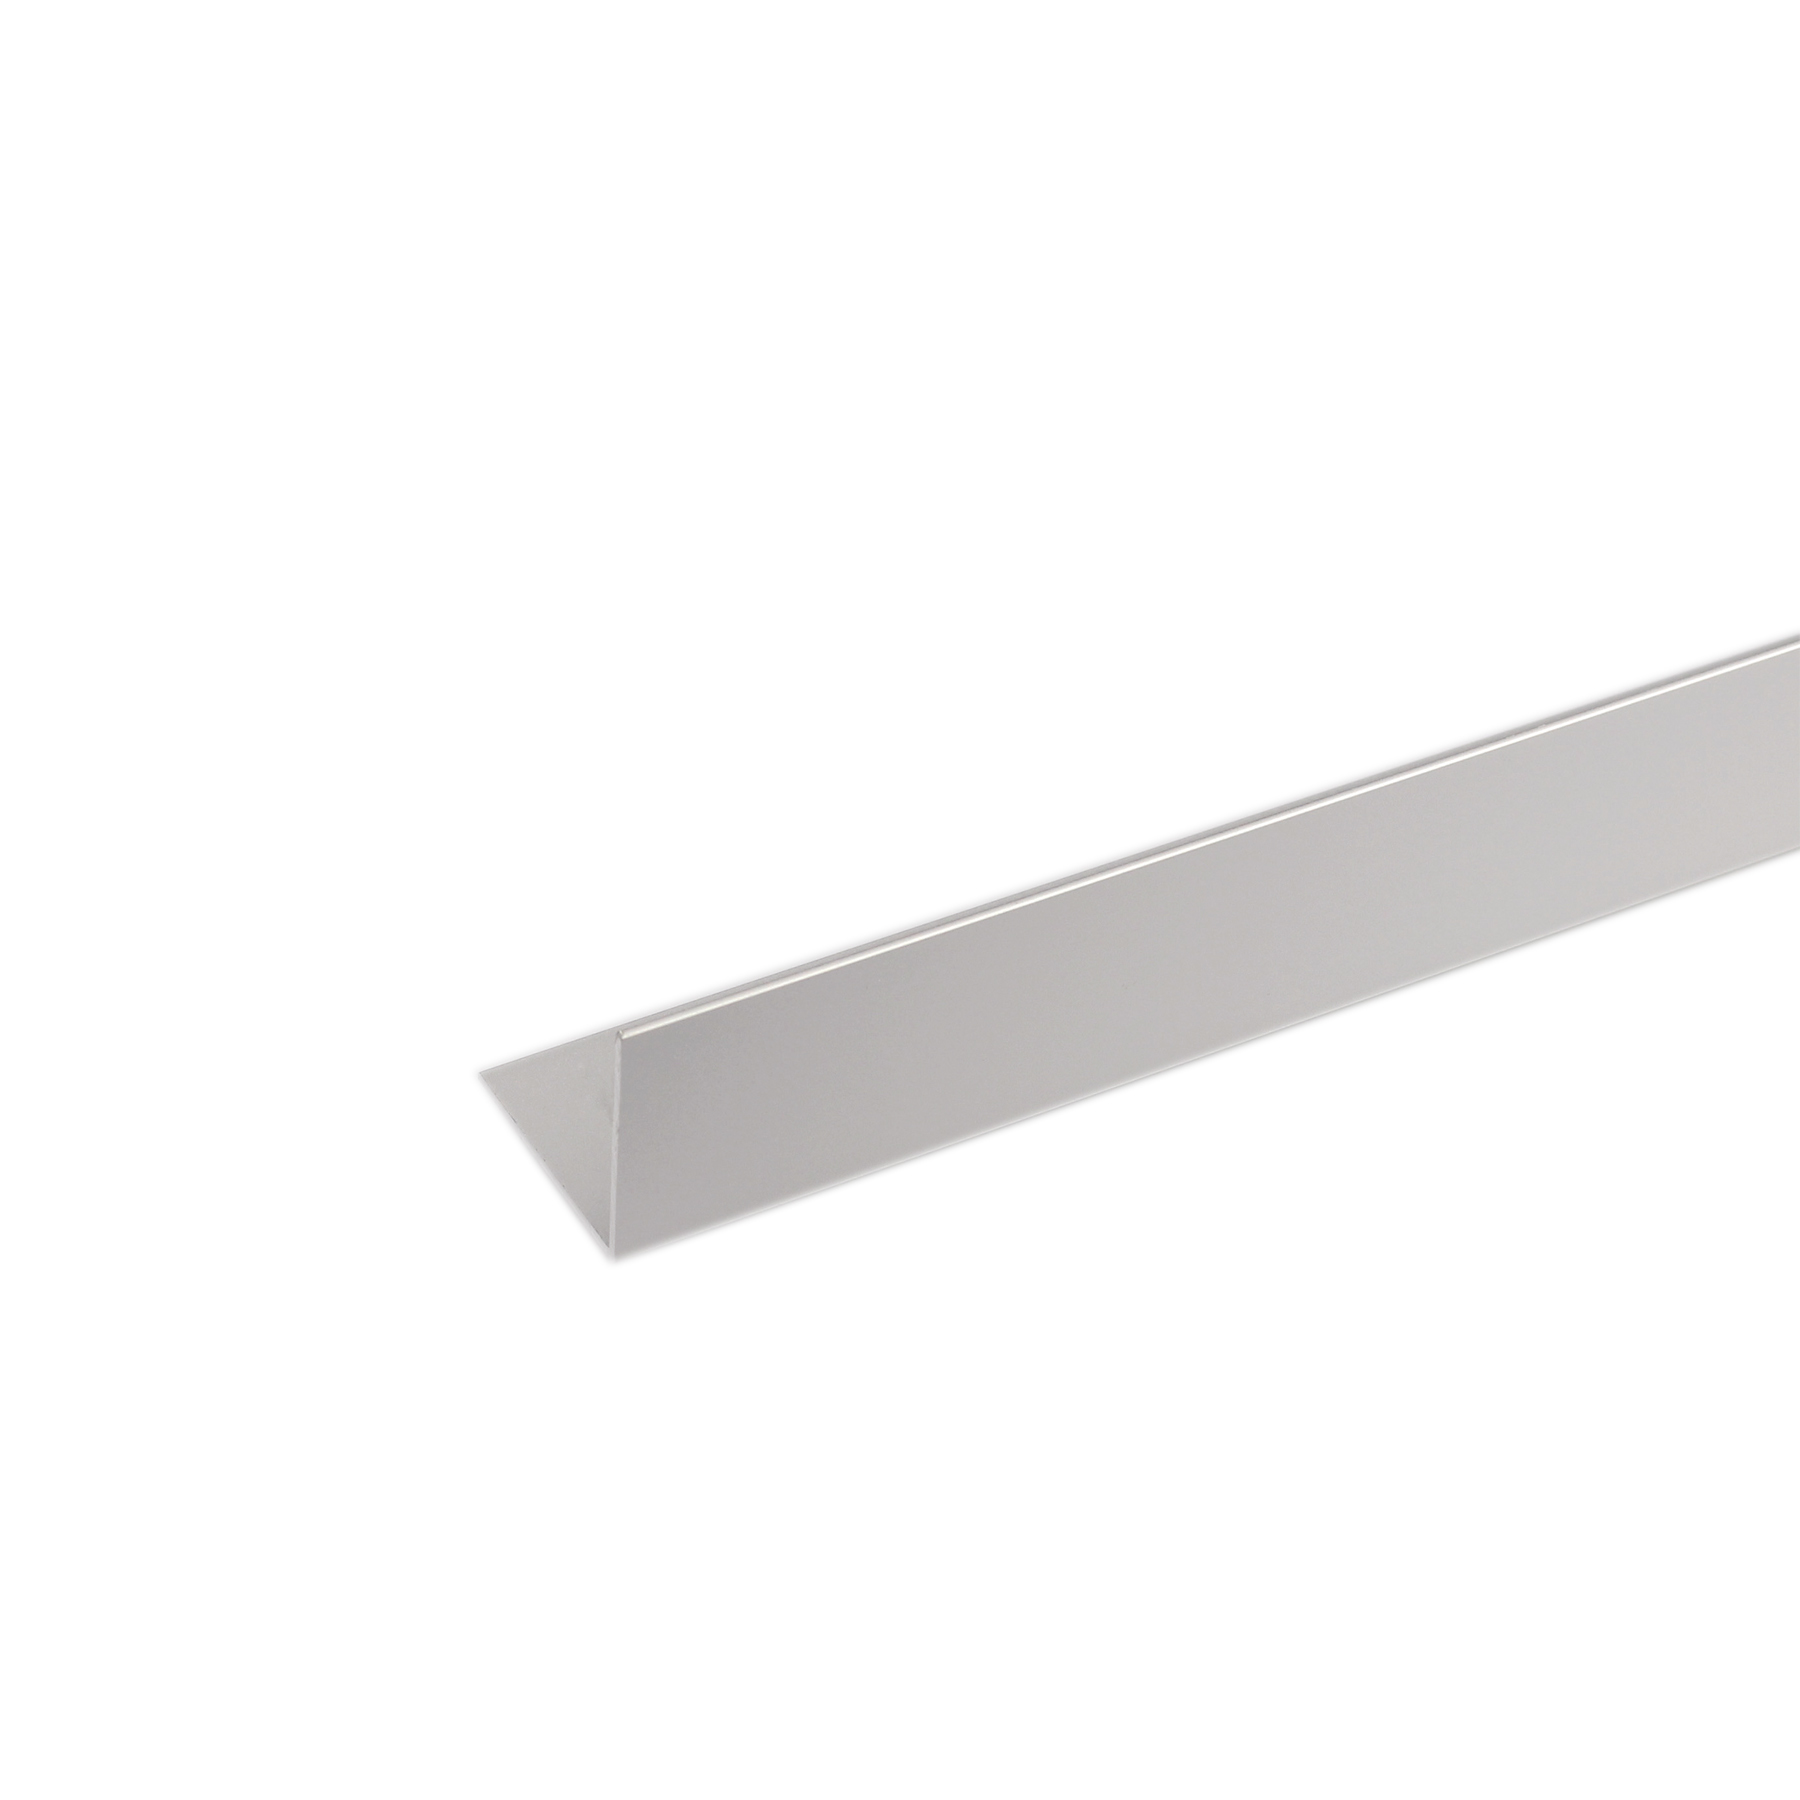 Perfil Canto Alumínio Anodizado 1mx1cm